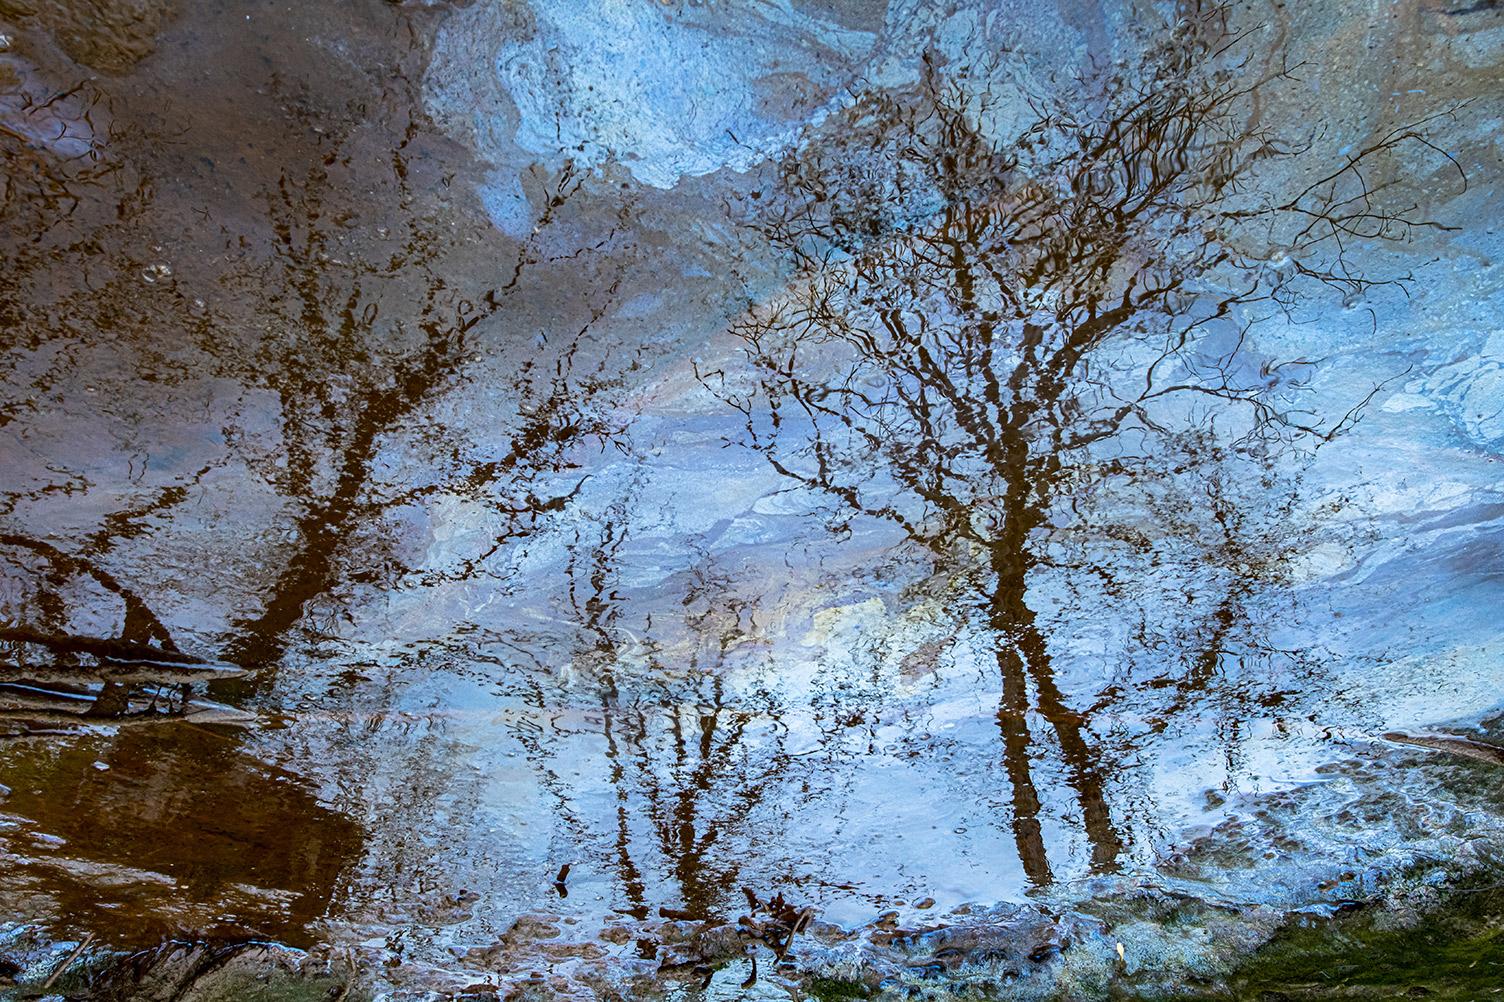 Impressionist Oil Painting - Ignacio Medem - Portfolio Natural, Fotografía de Naturaleza de Autor